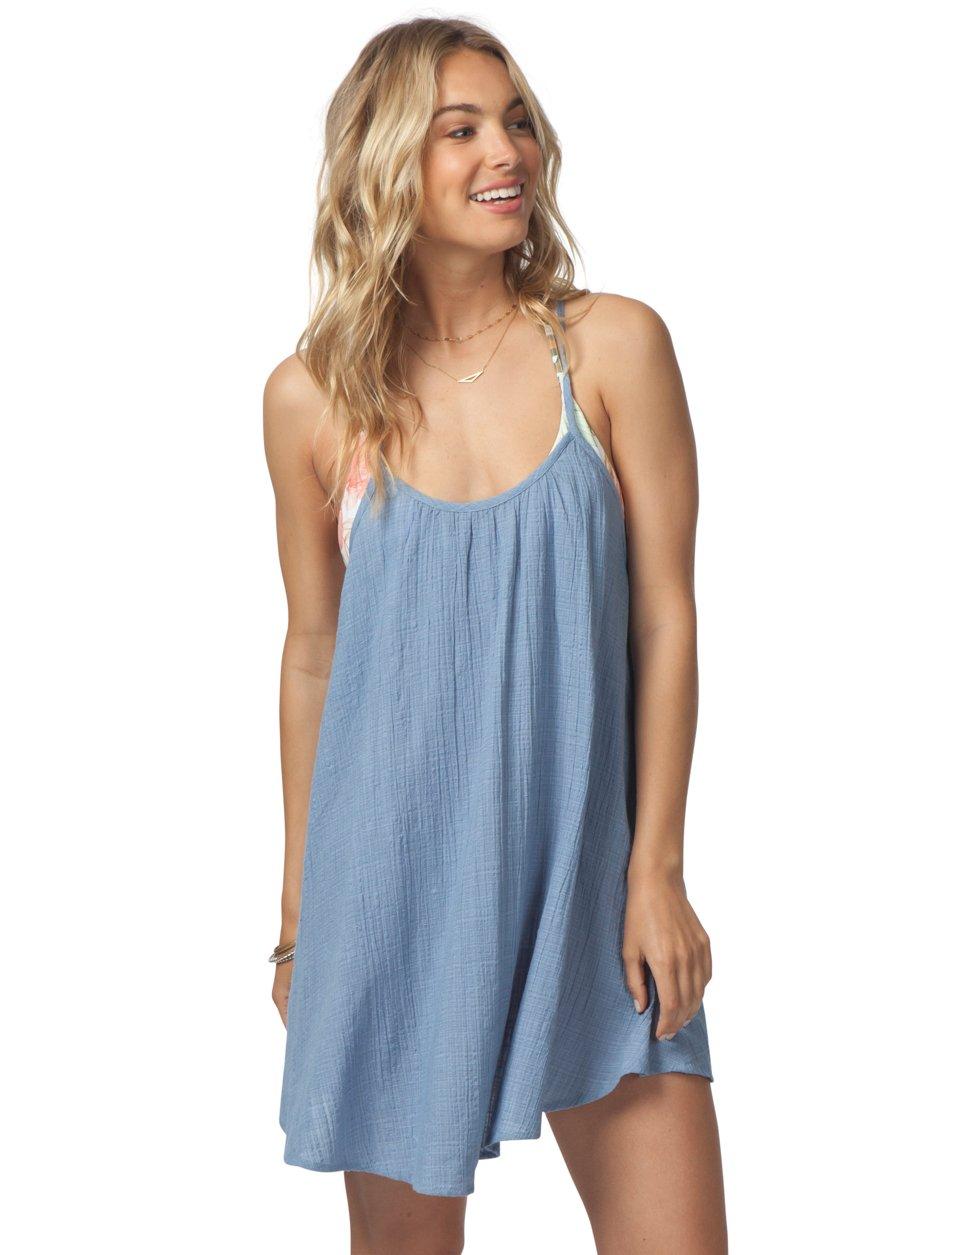 Rip Curl Surf Essentials Cover Up Dress Blue 1bdd581bb